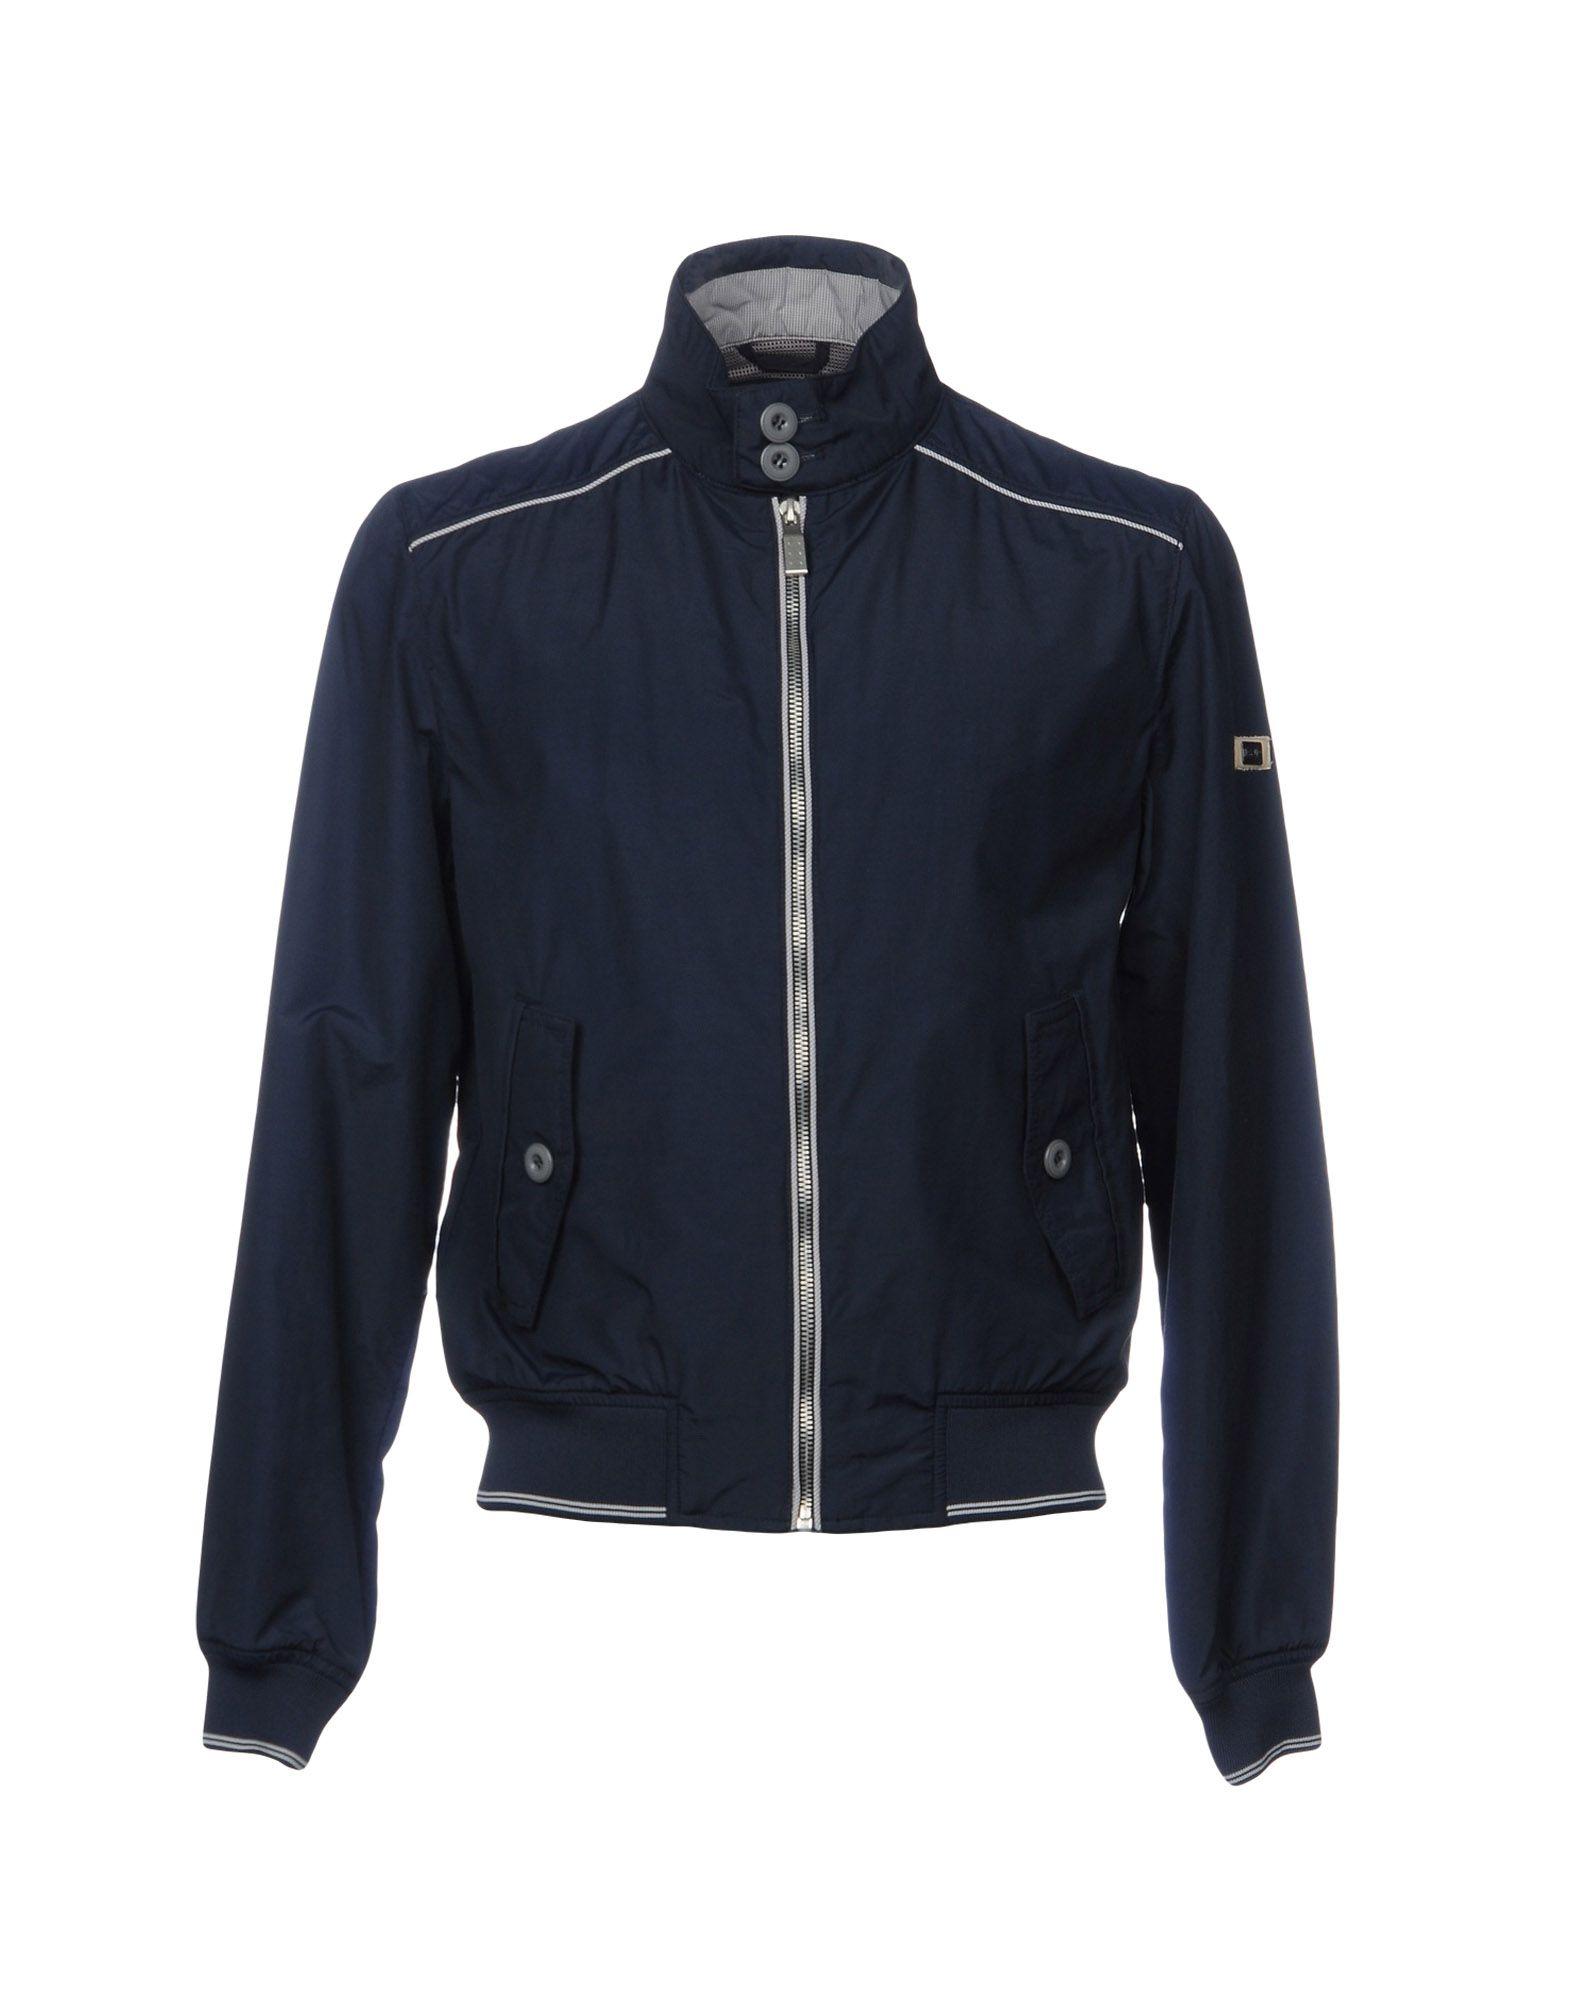 куртка для мальчика 18607 355 красный noble people P&P PEOPLE Куртка